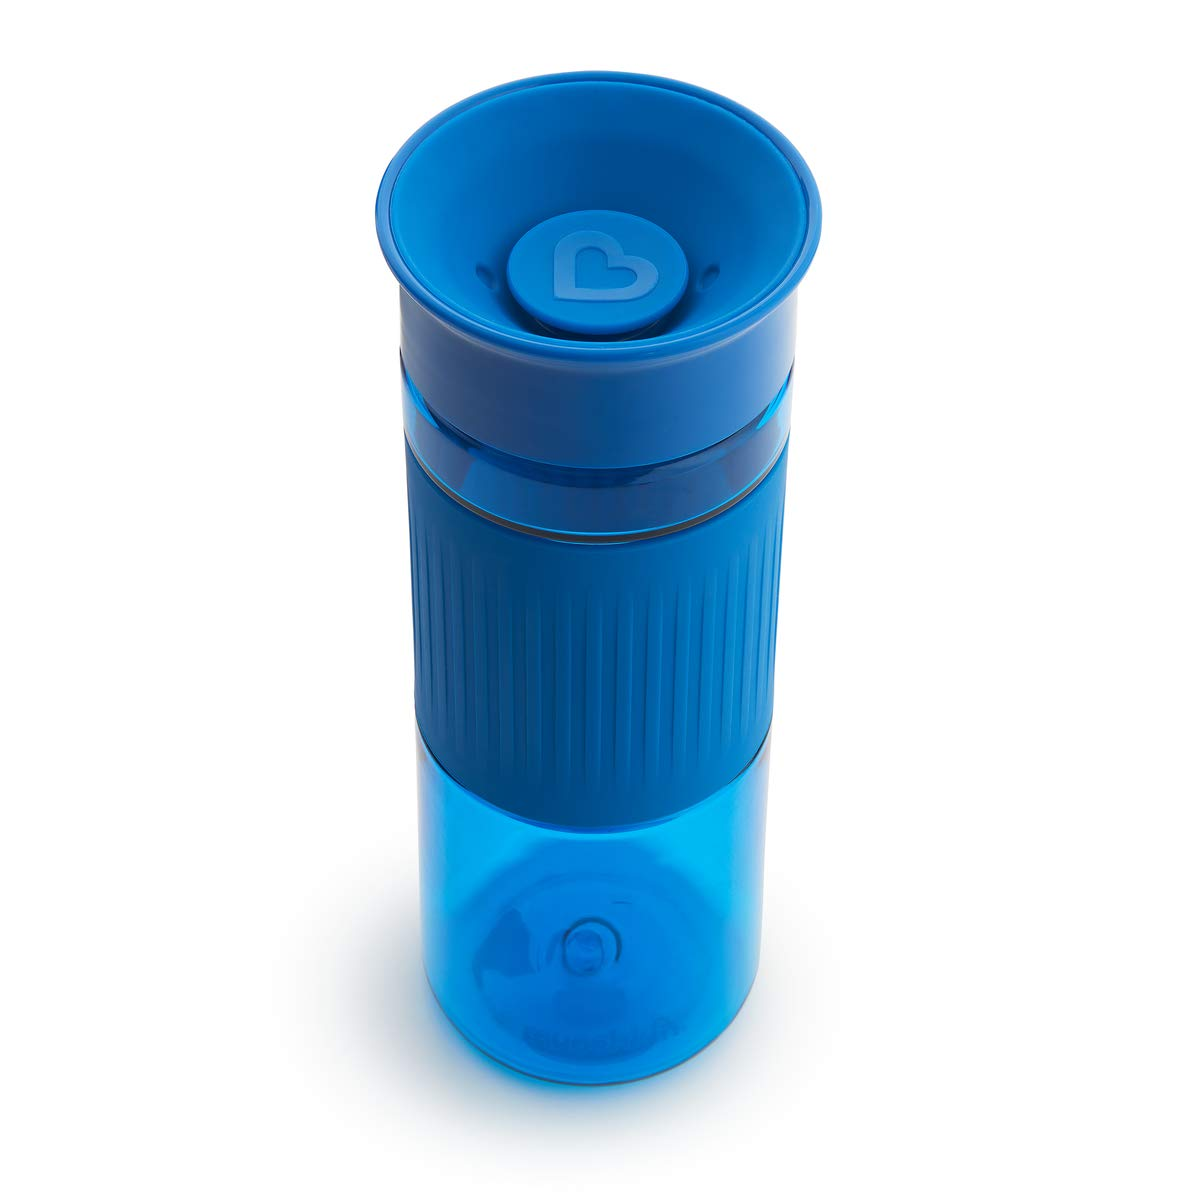 Munchkin Miracle 360ᵒ Trinkflasche blau 710 ml MUNAF|#Munchkin 012492